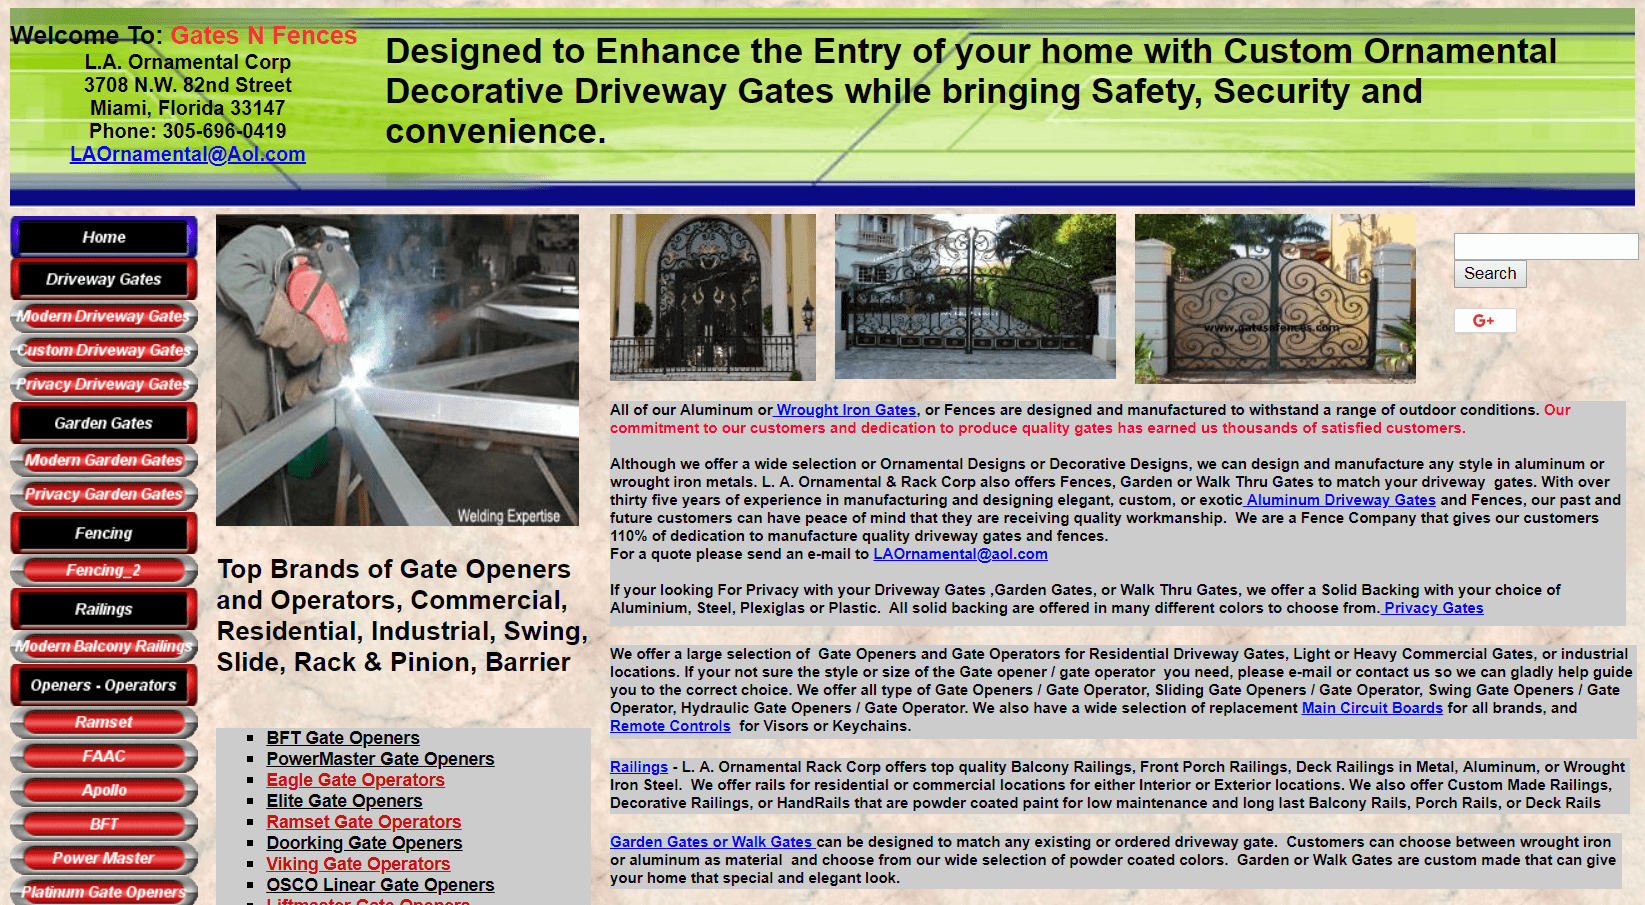 The Gates N Fences website.